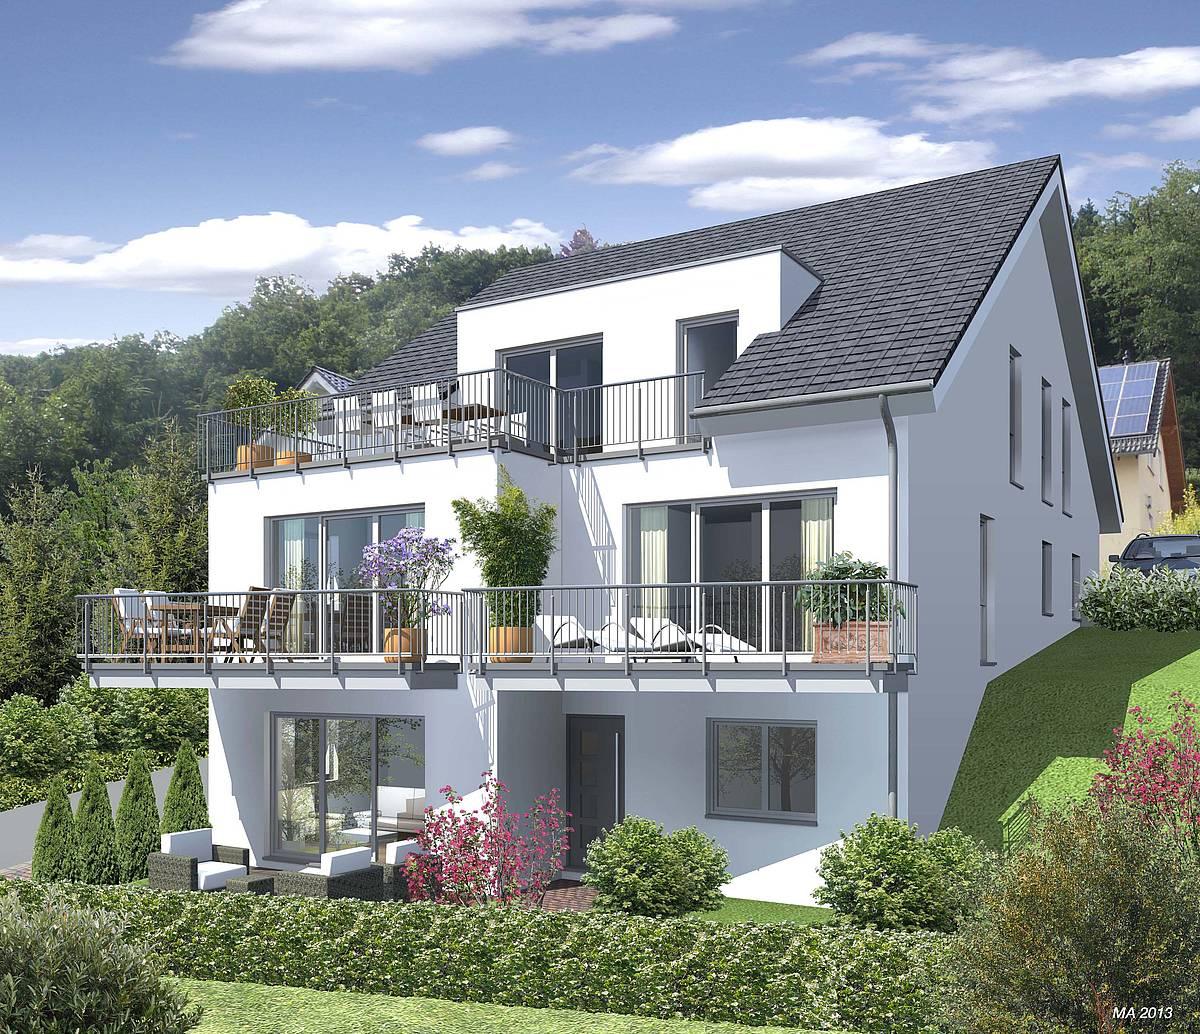 neubau 4 familienhaus in engelskirchen zaunm ller. Black Bedroom Furniture Sets. Home Design Ideas